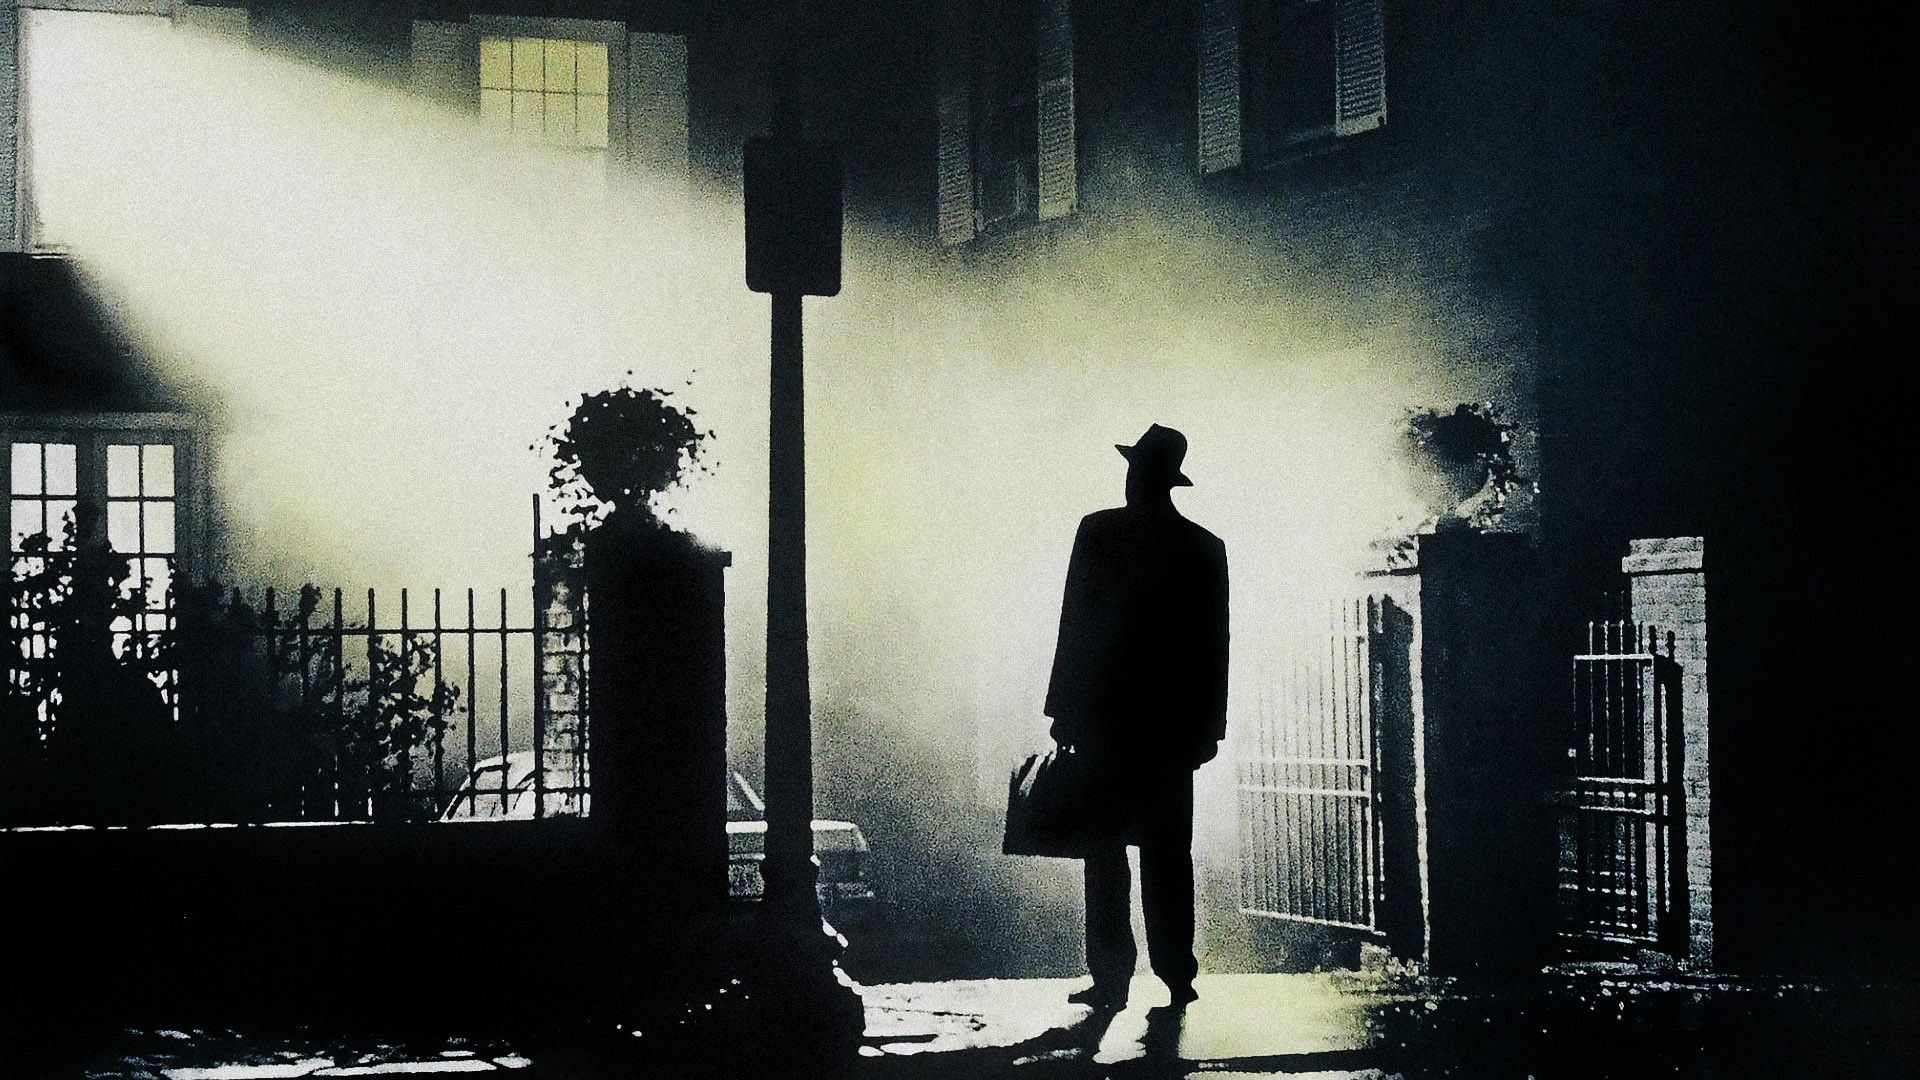 Horror Movie Wallpapers - Top Free Horror Movie ...